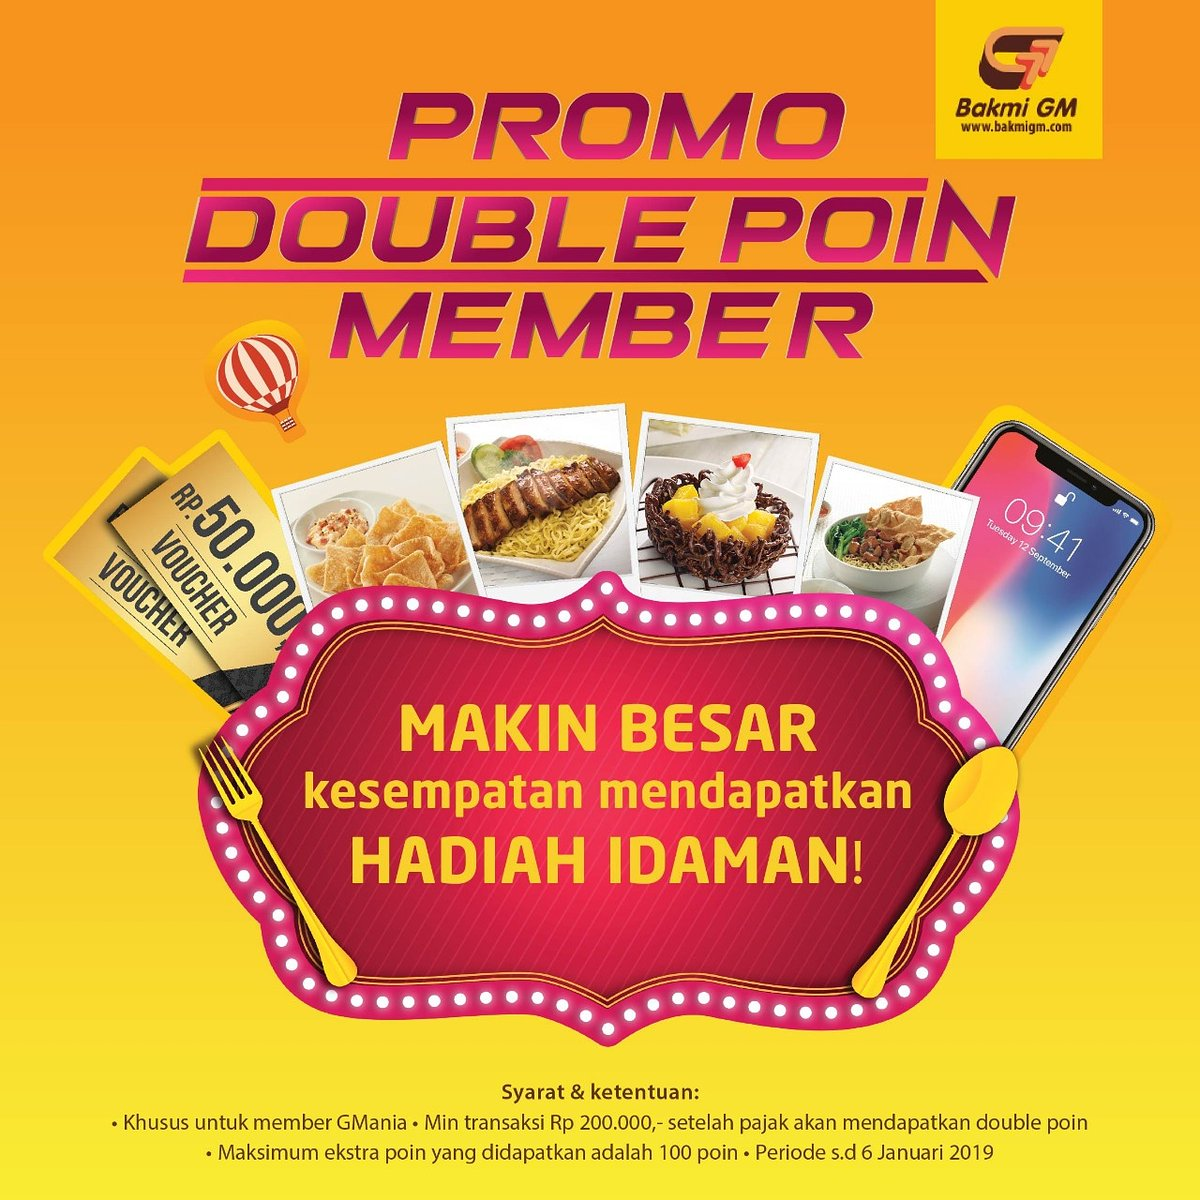 #BakmiGM - Promo Double Poin Member Min Transaksi 200K (s.d 06 Jan 2019)